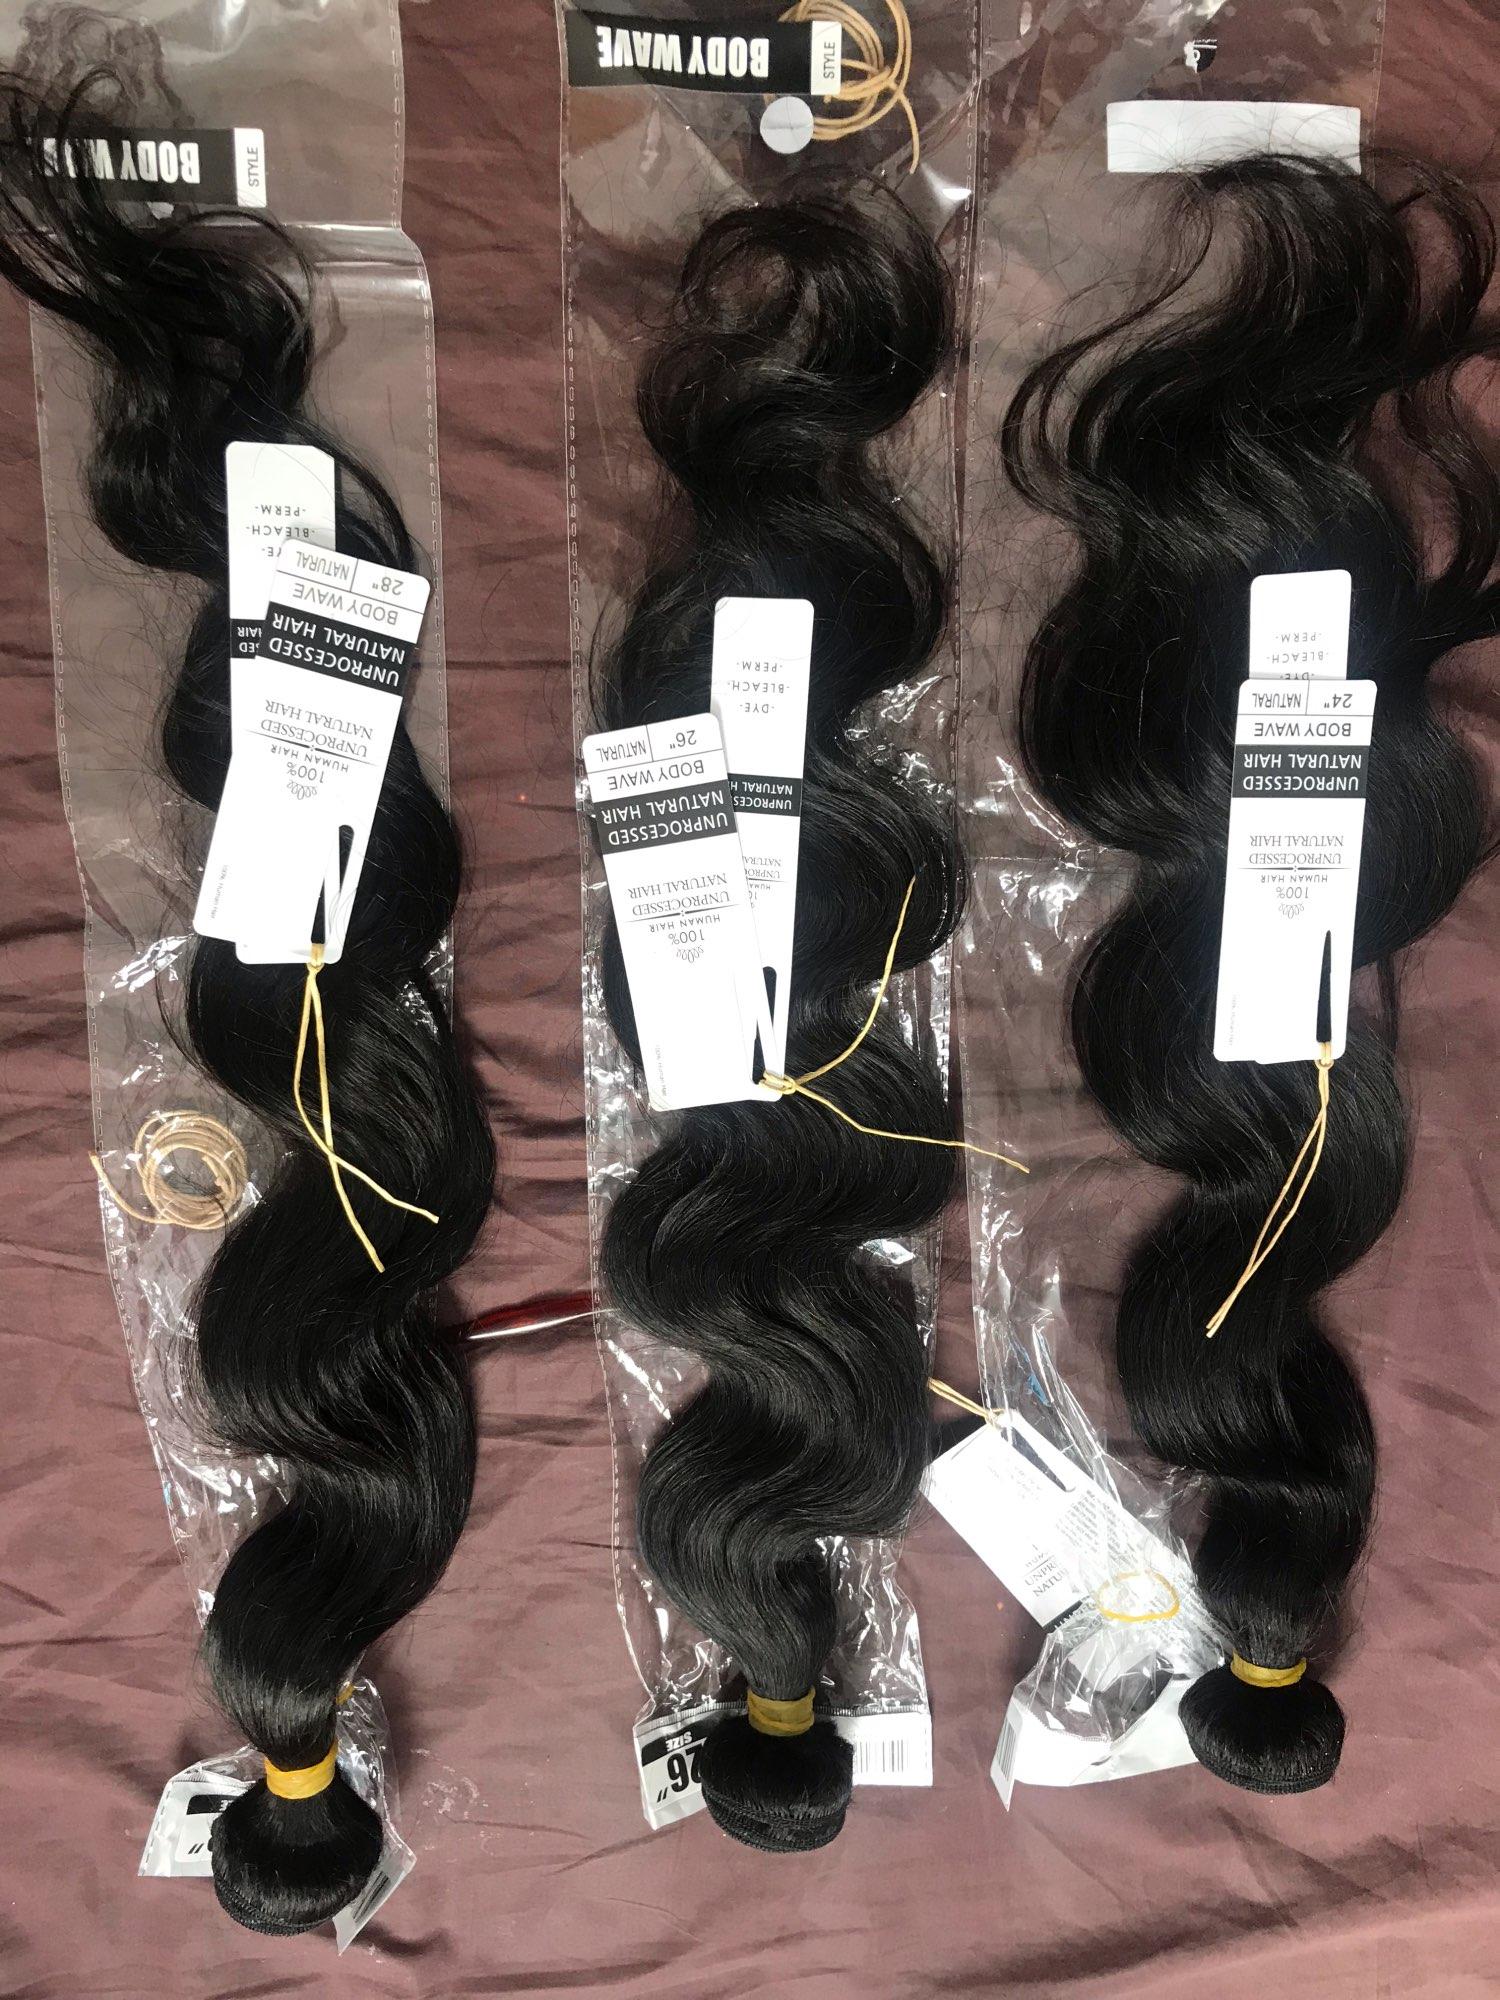 Beau Hair Body Wave Bundles With Closure Remy Human Hair Bundles With Frontal Weaves With Closure 12A Brazilian Hair Extension|bundles with lace frontal|bundles with closurebundles with frontal - AliExpress